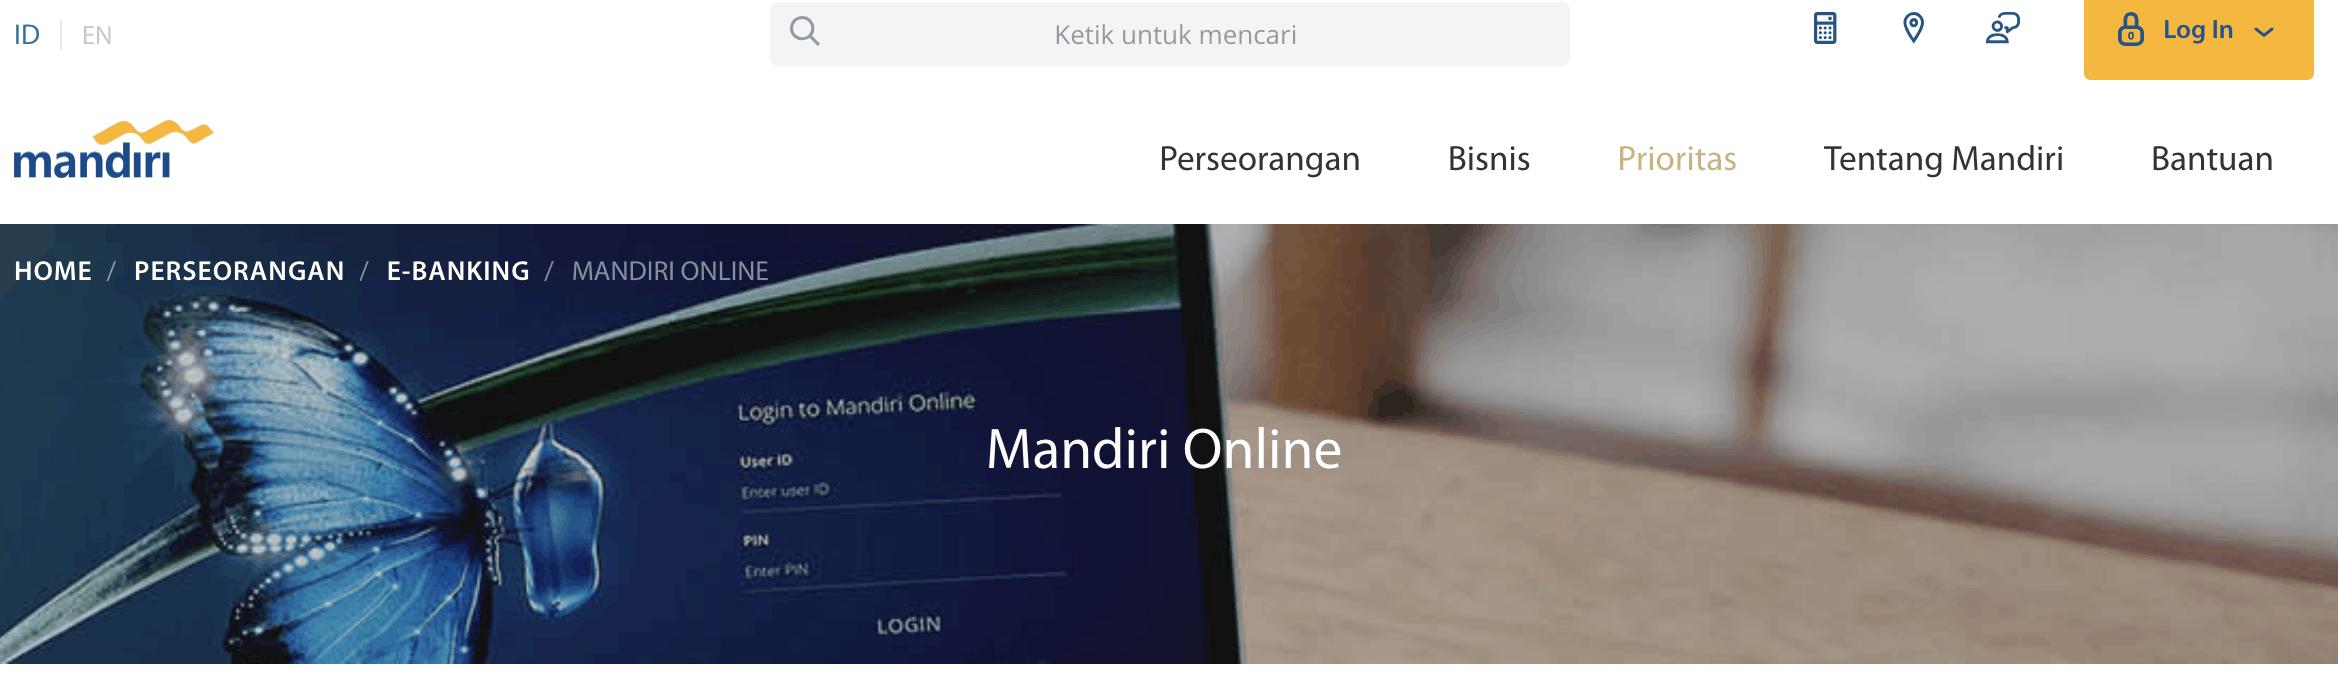 aplikasi mobile banking terbaik bank mandiri